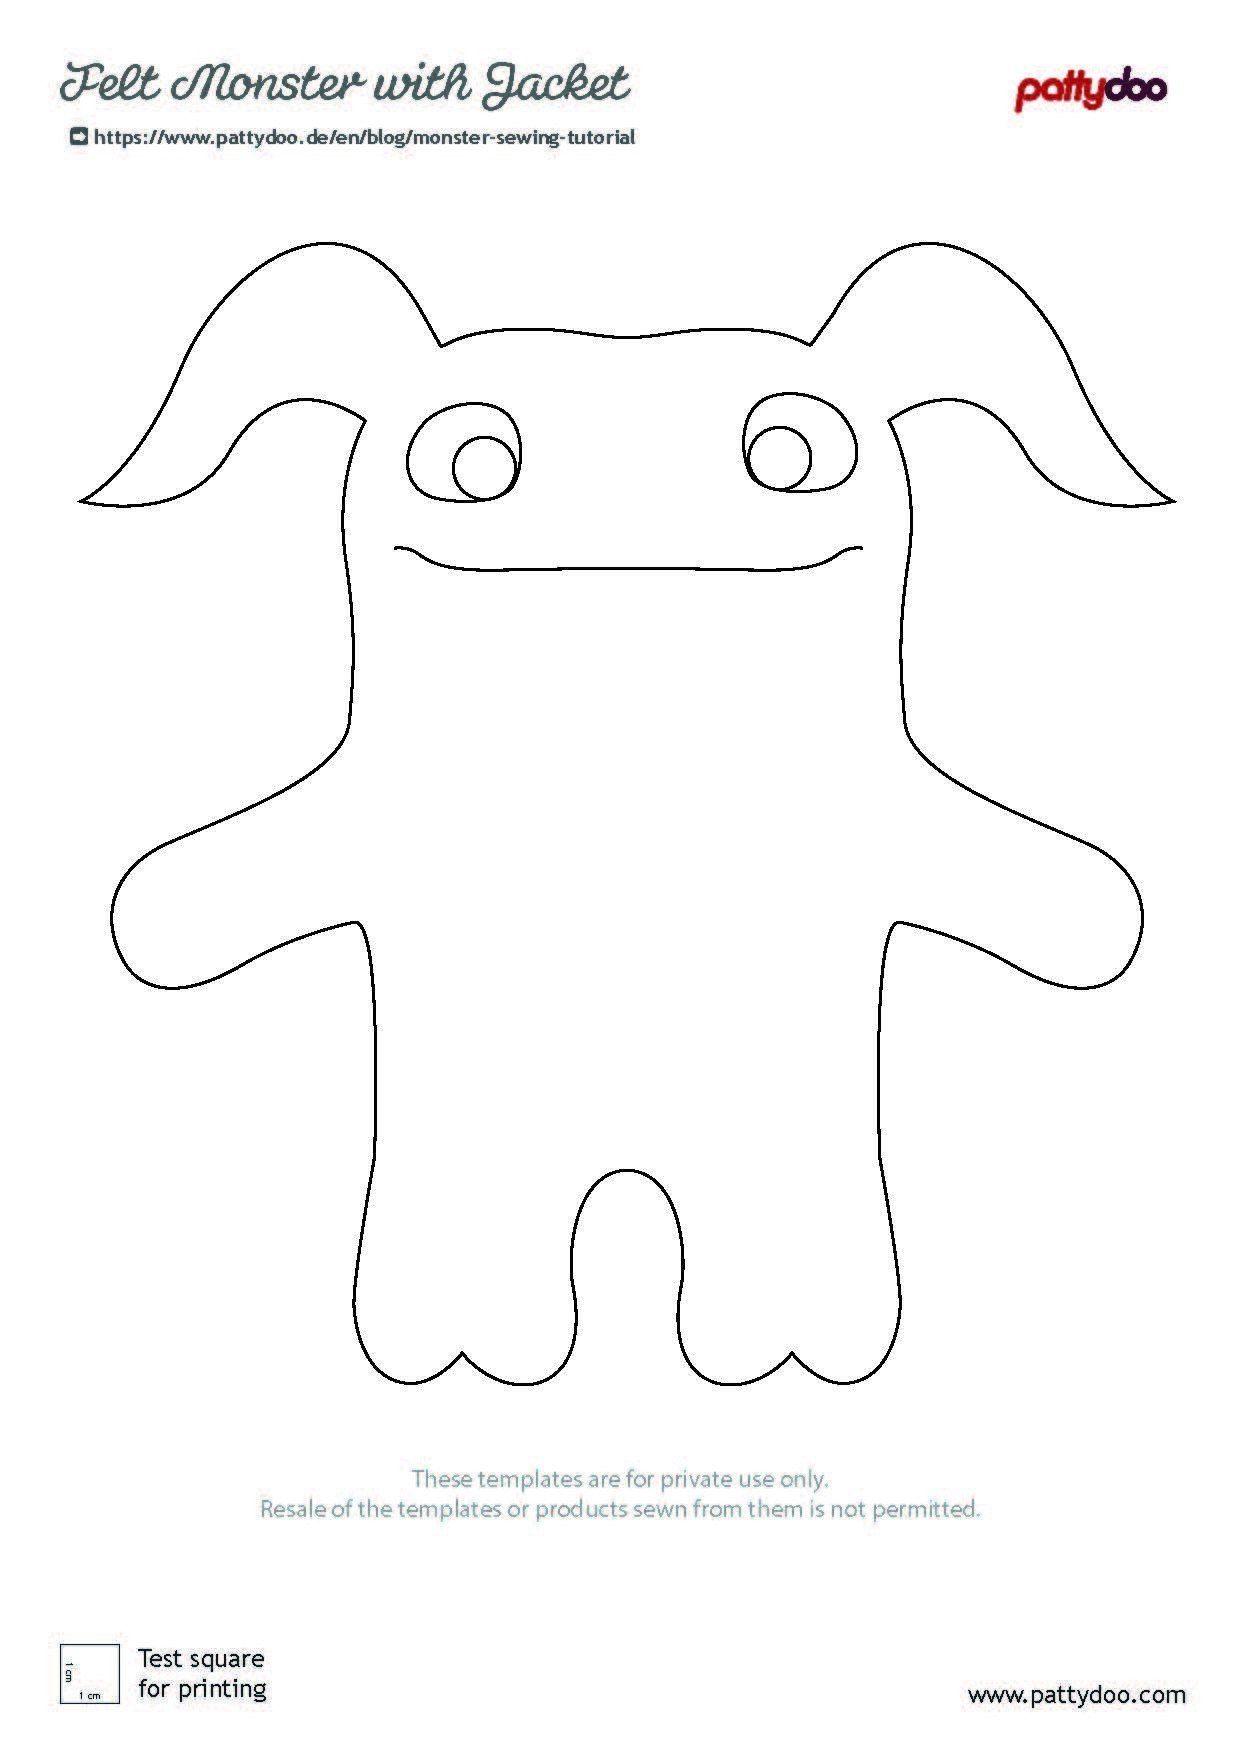 Outstanding Moldes Para Imprimir De Gatos En Fieltro Ideas De Manualidades Wiring Cloud Licukshollocom